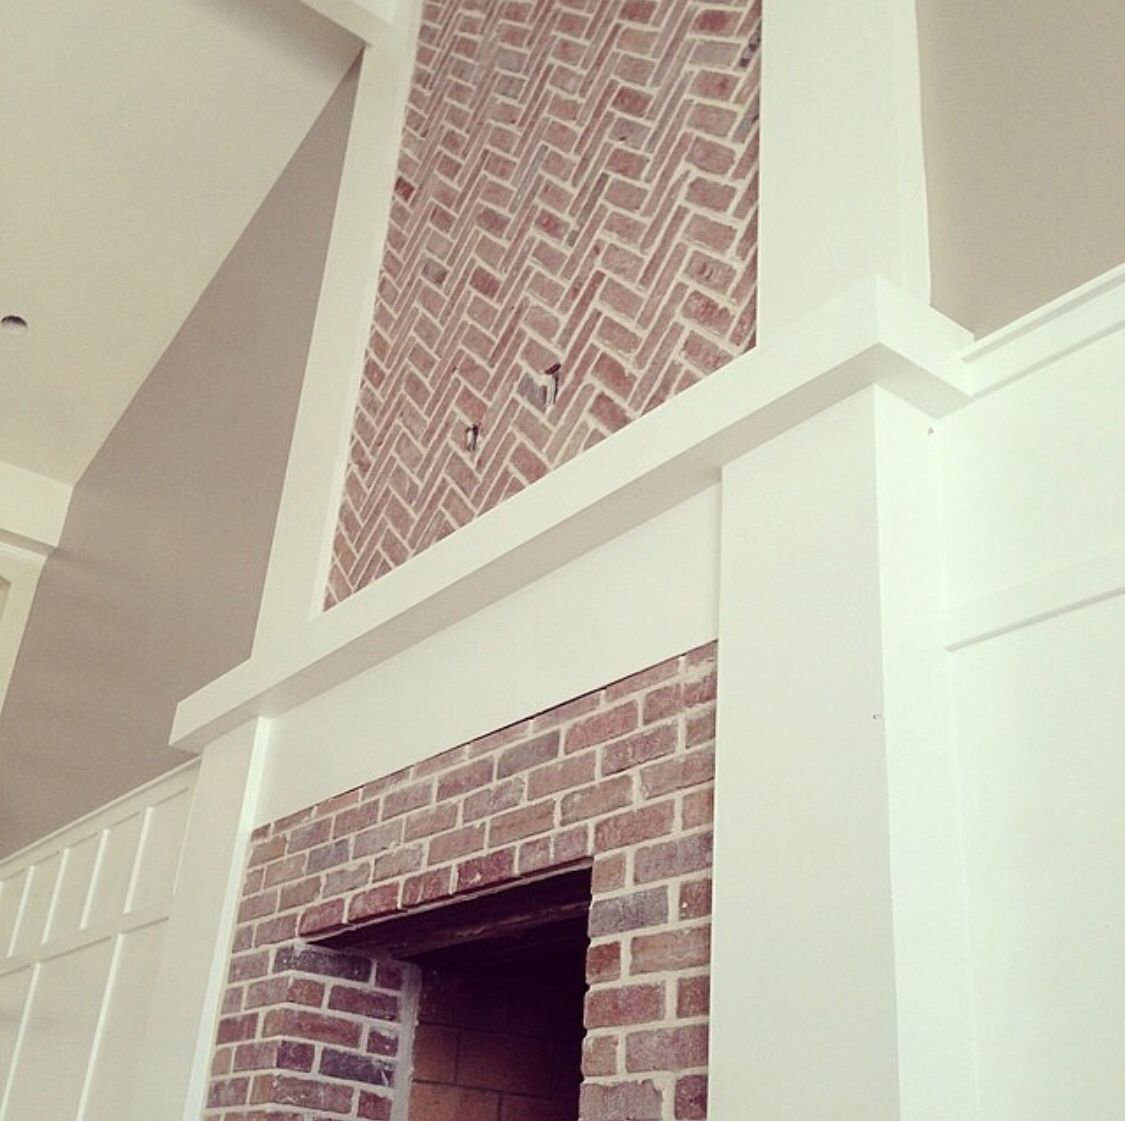 Herringbone Brick Fireplace design.